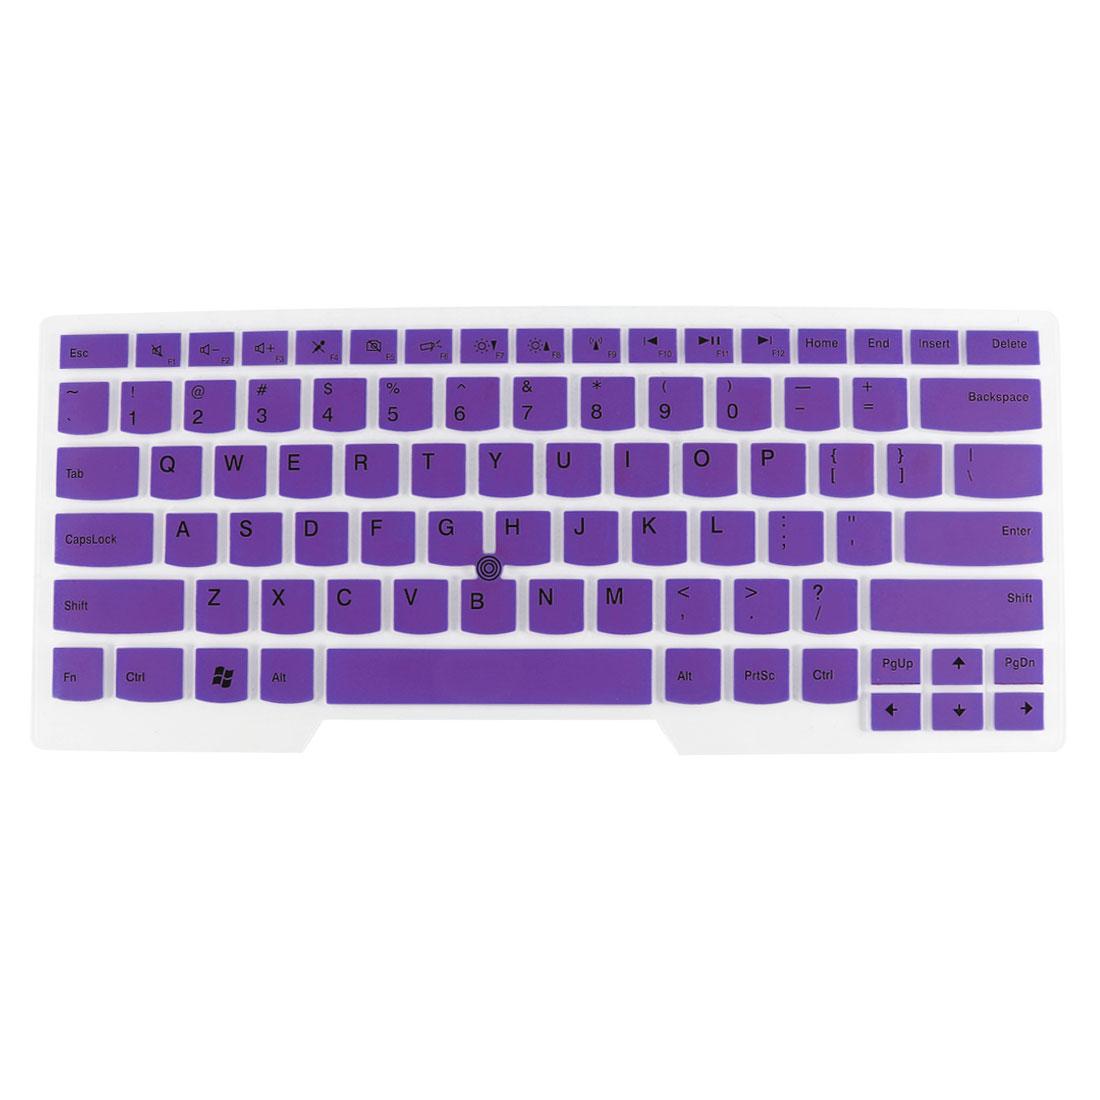 Laptop Keyboard Protector Film Purple Clear for IBM E430/E435/E330/T430/X230